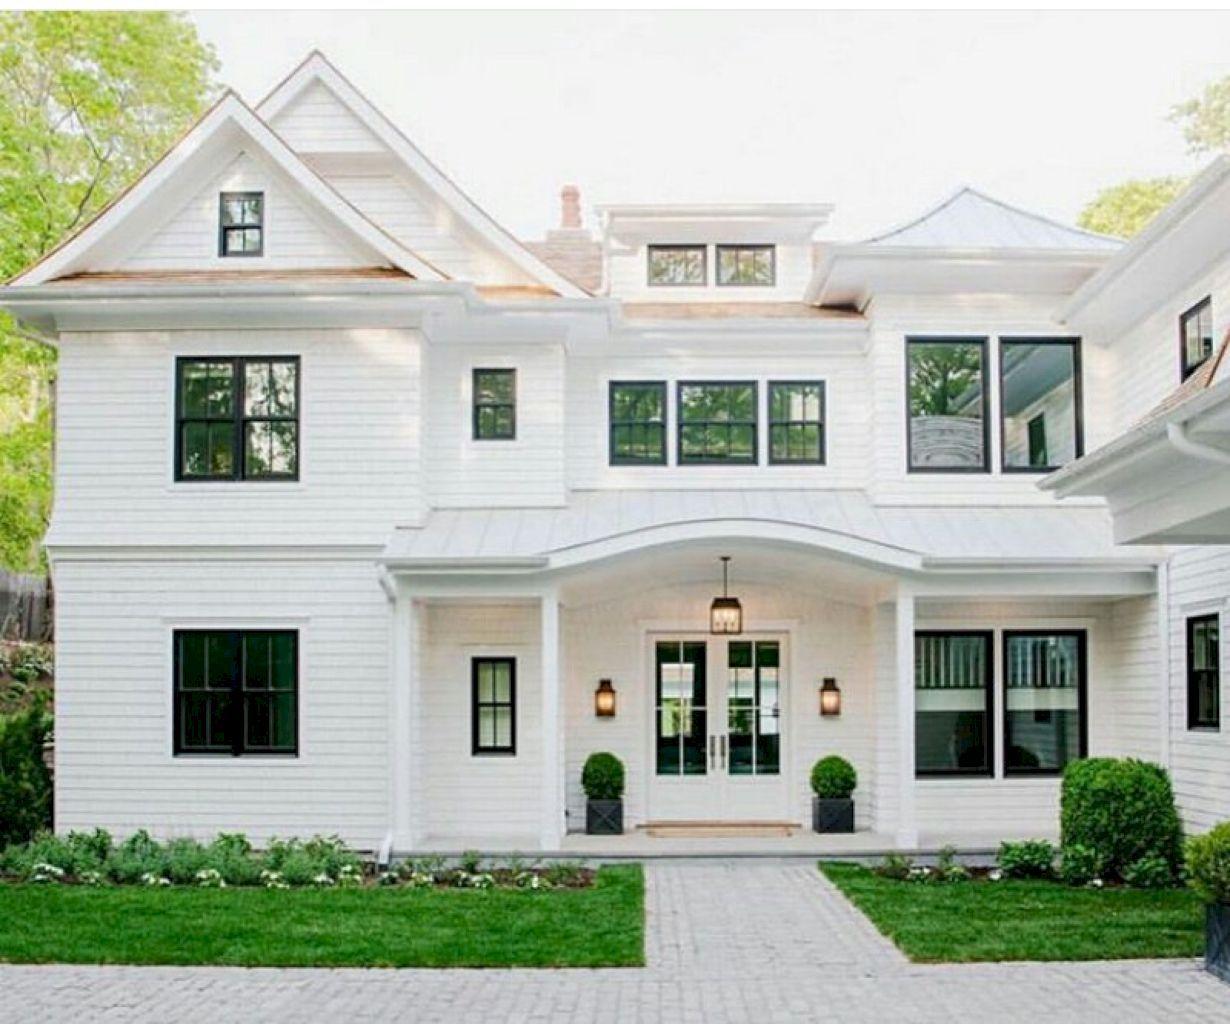 45 Modern Farmhouse Exterior Design Ideas | Modern farmhouse ...